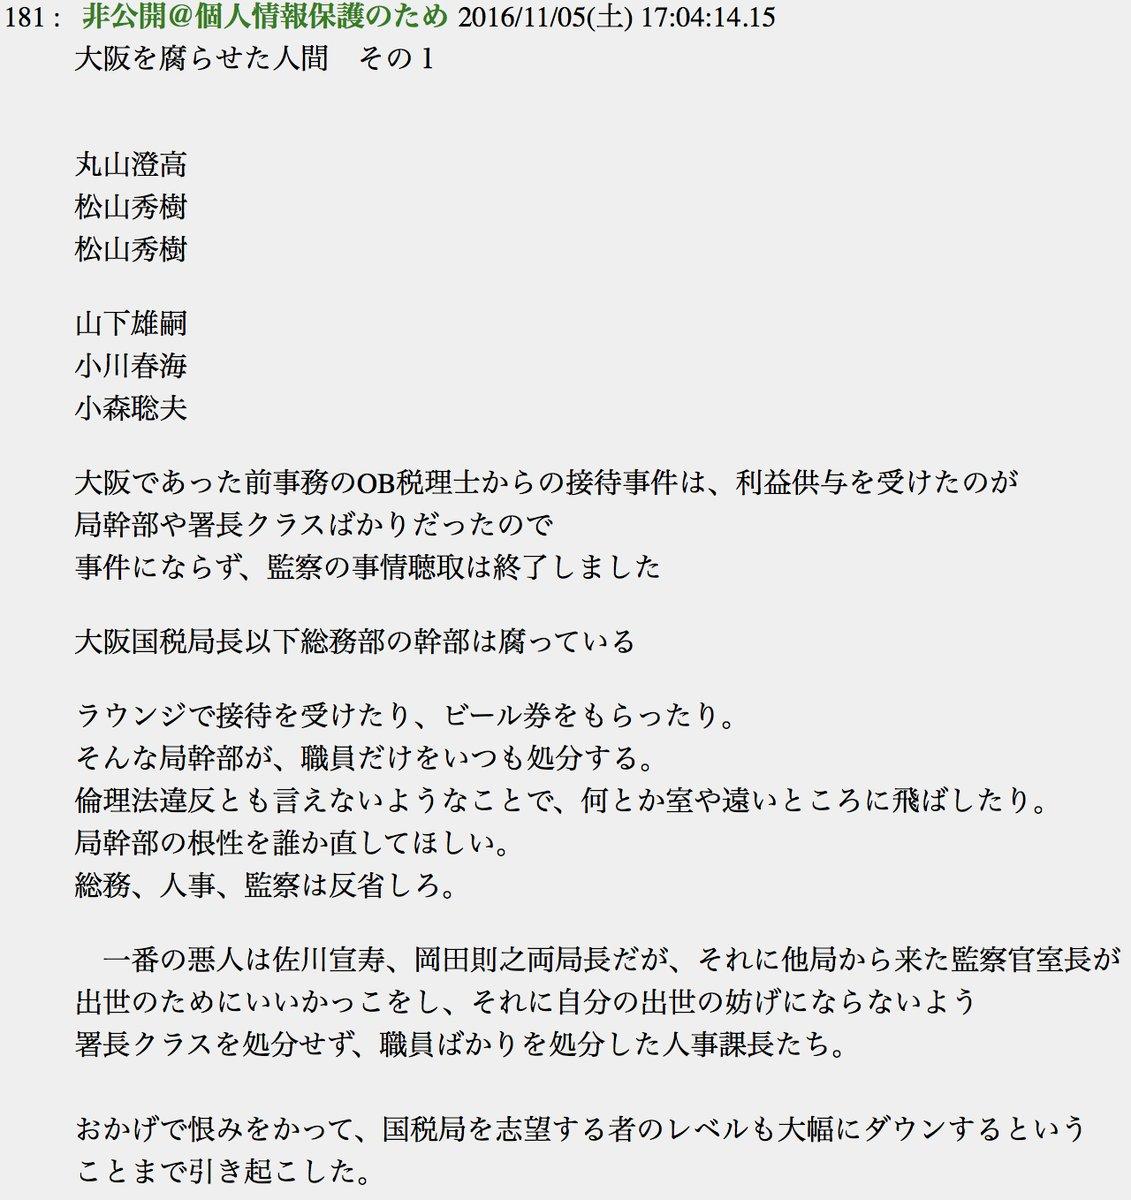 C7uV_-fVMAAdT3_.jpg